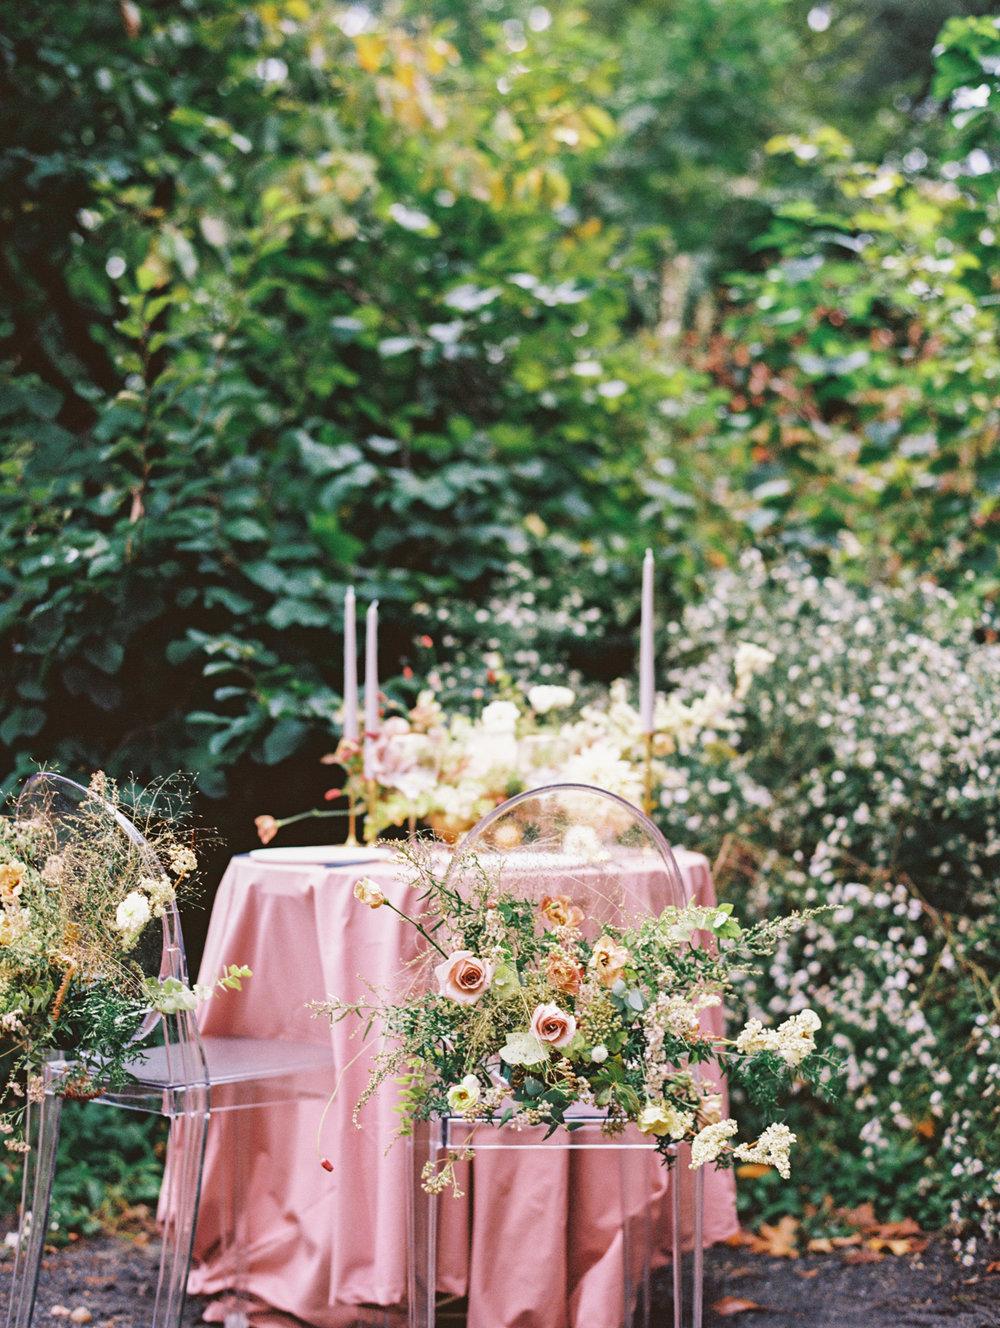 kelsandmichael_bridaleditorial_harvestelopement-9.jpg